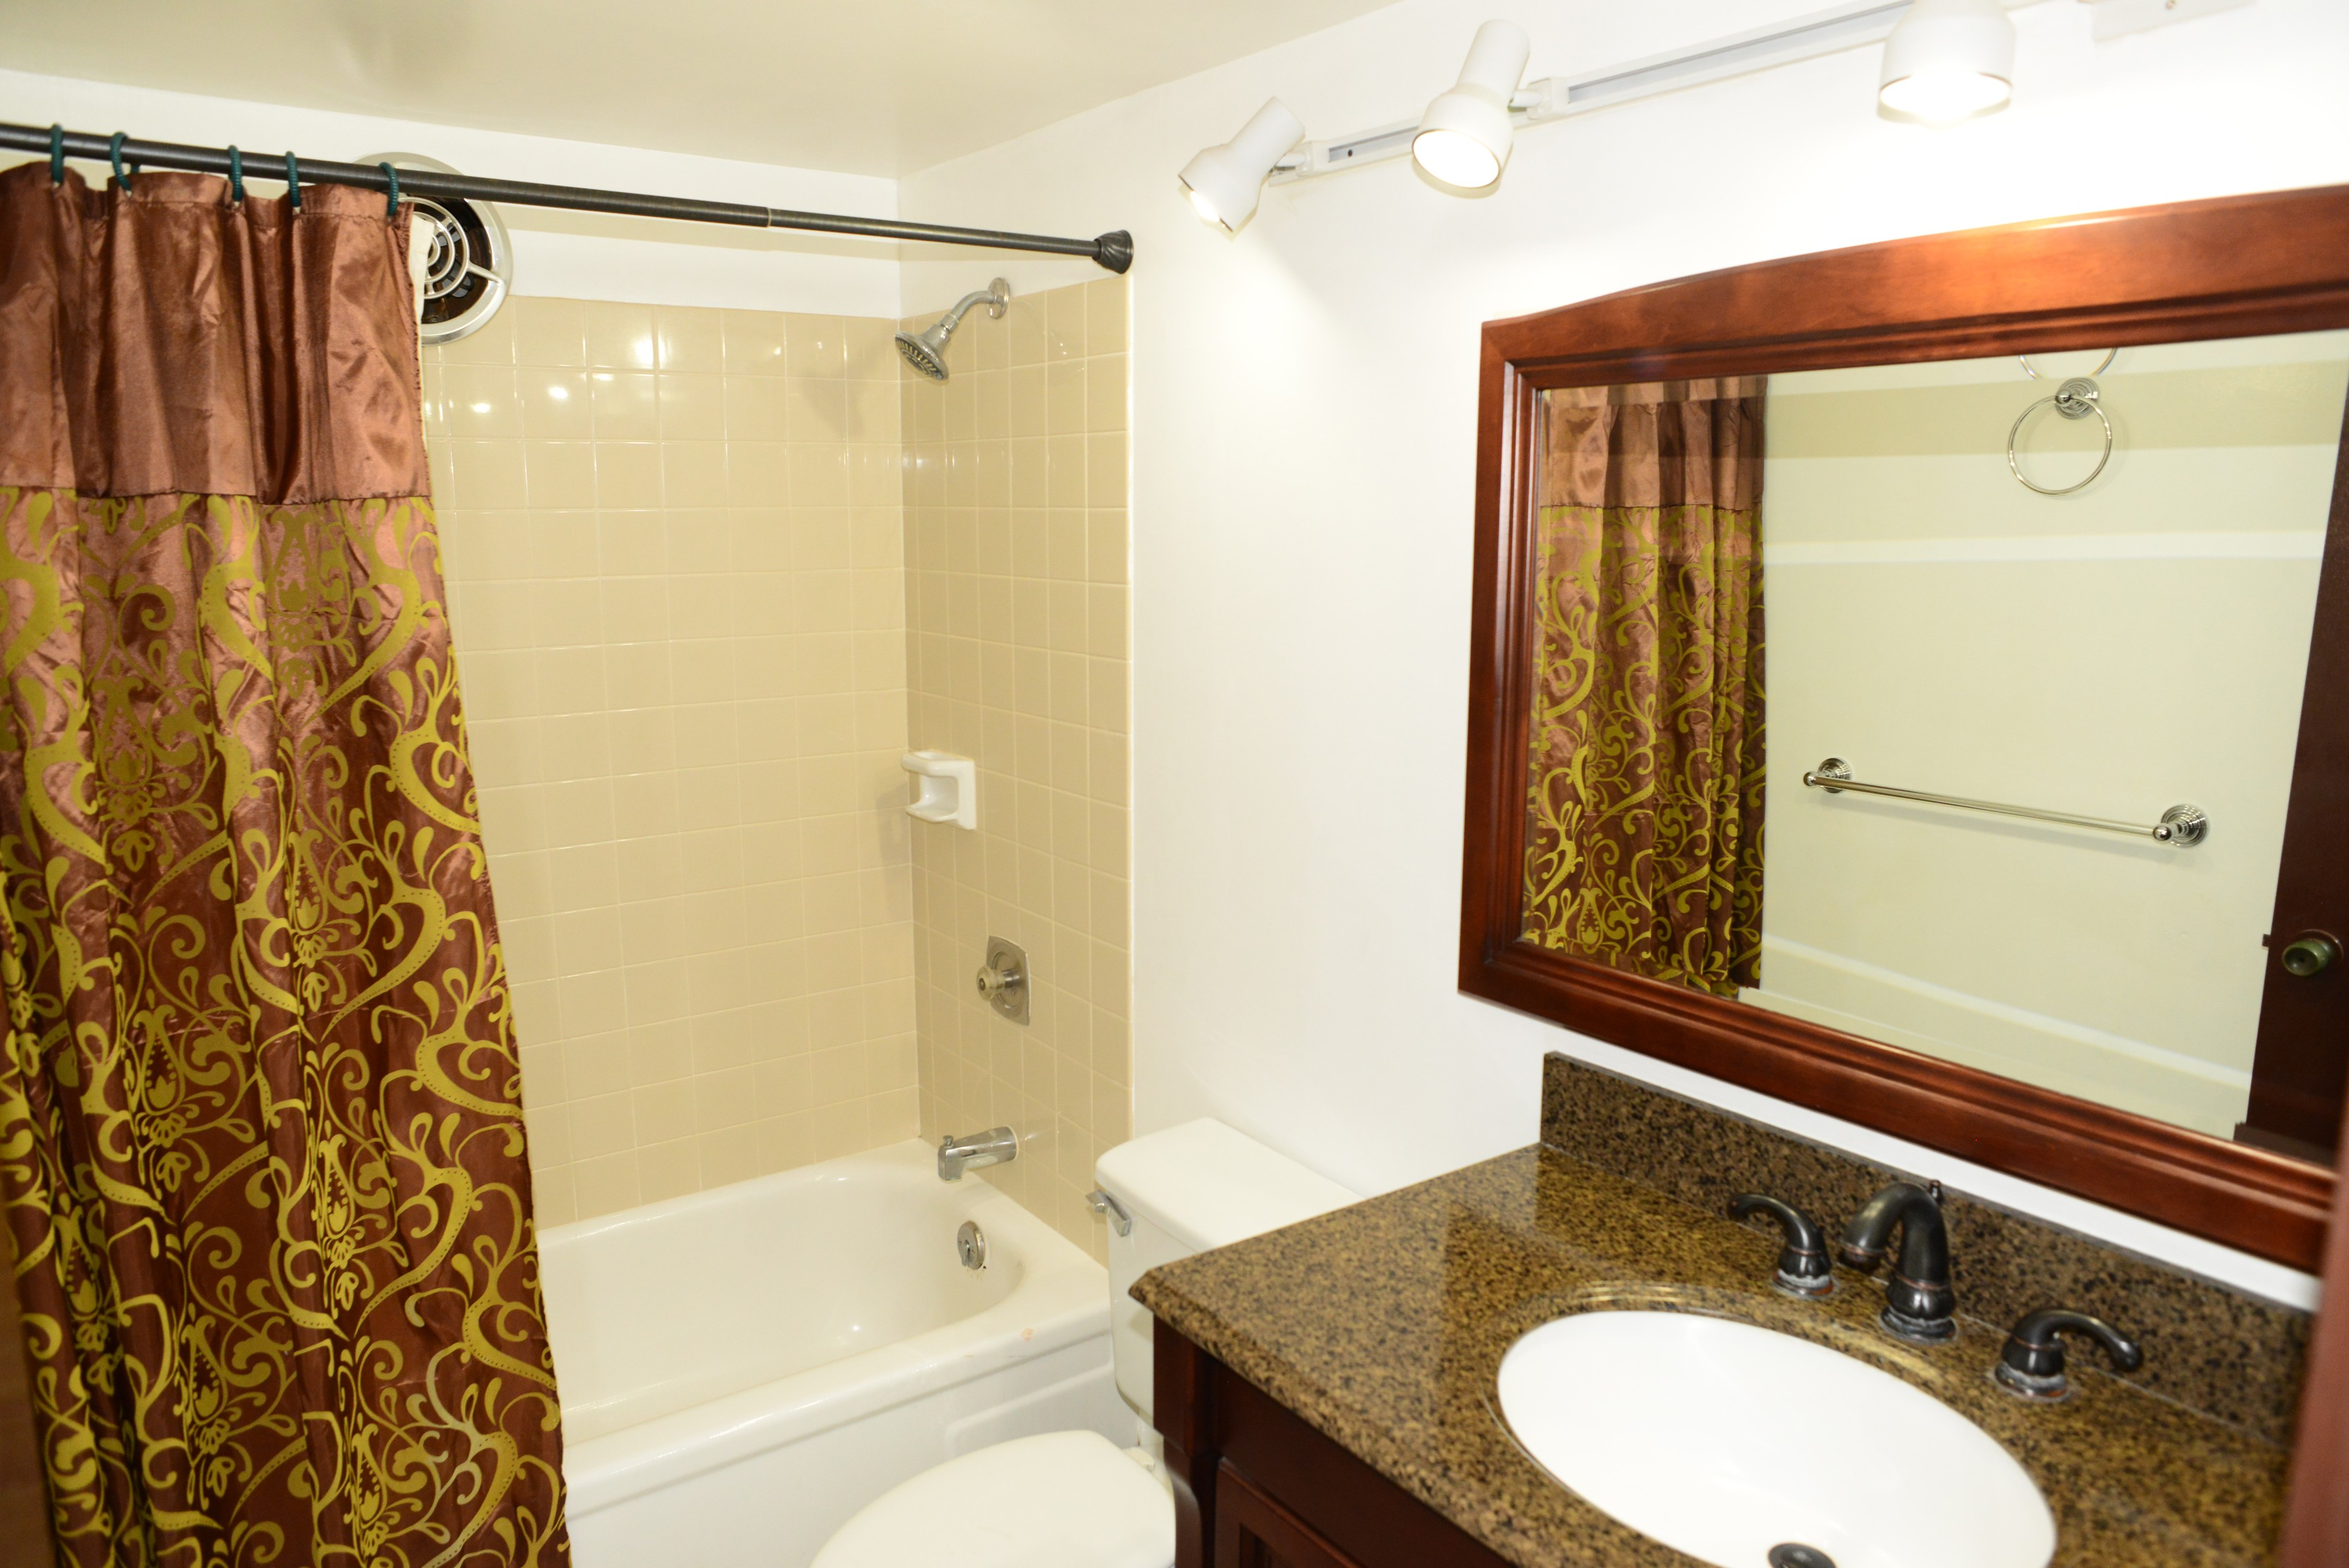 1634 Nuuanu Ave 111 Honolulu Hi 96817 2 Bedroom